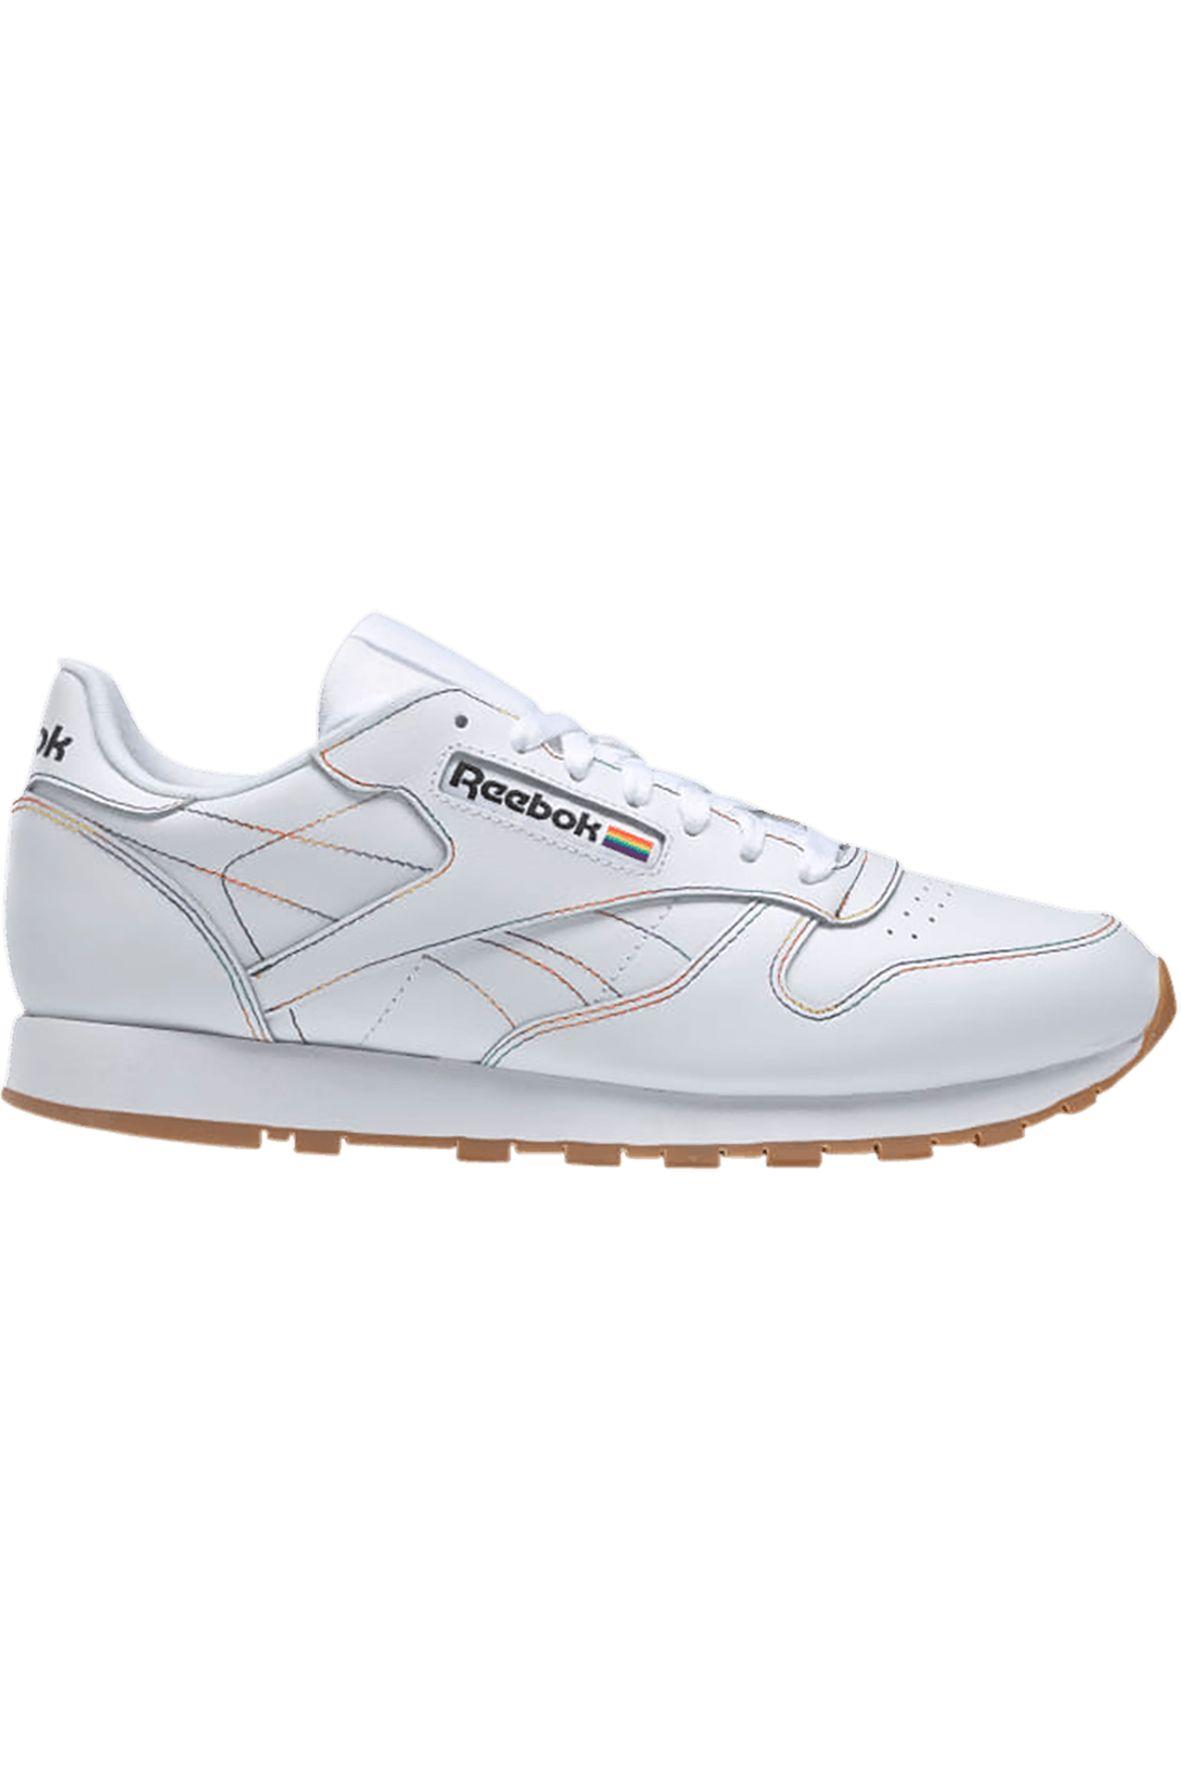 Reebok Shoes CL LTHR White/Emeral/Cobalt